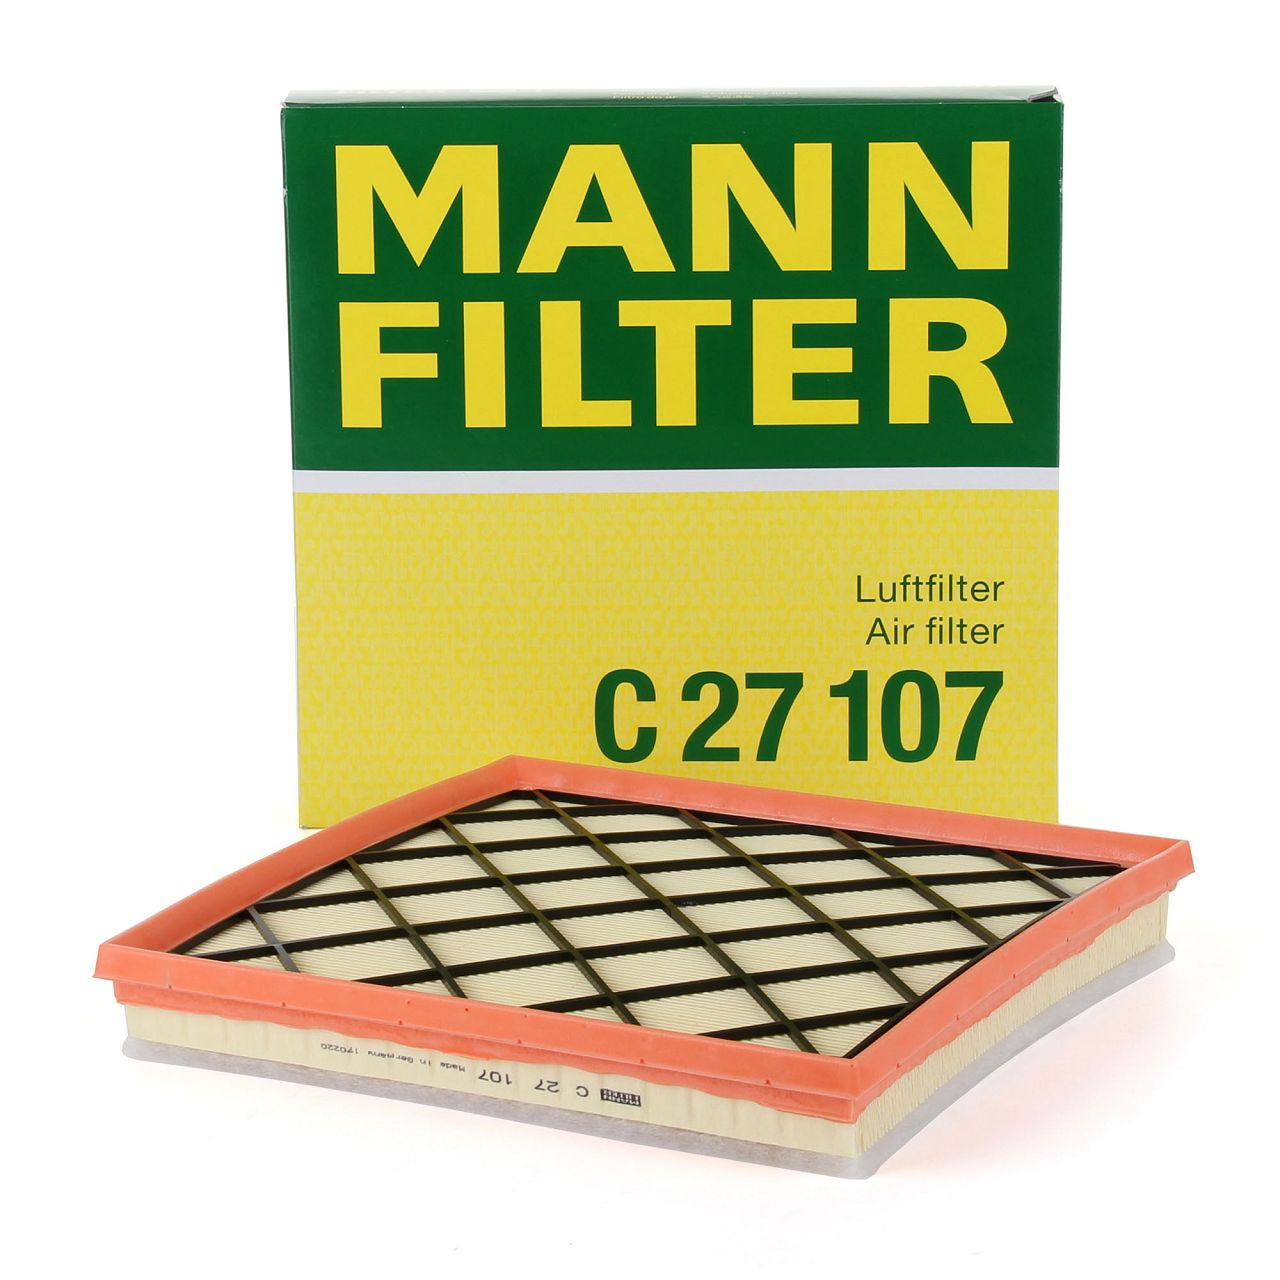 MANN Luftfilter C27107 für CHEVROLET CRUZE ORLANDO OPEL ASTRA J CASCADA ZAFIRA C